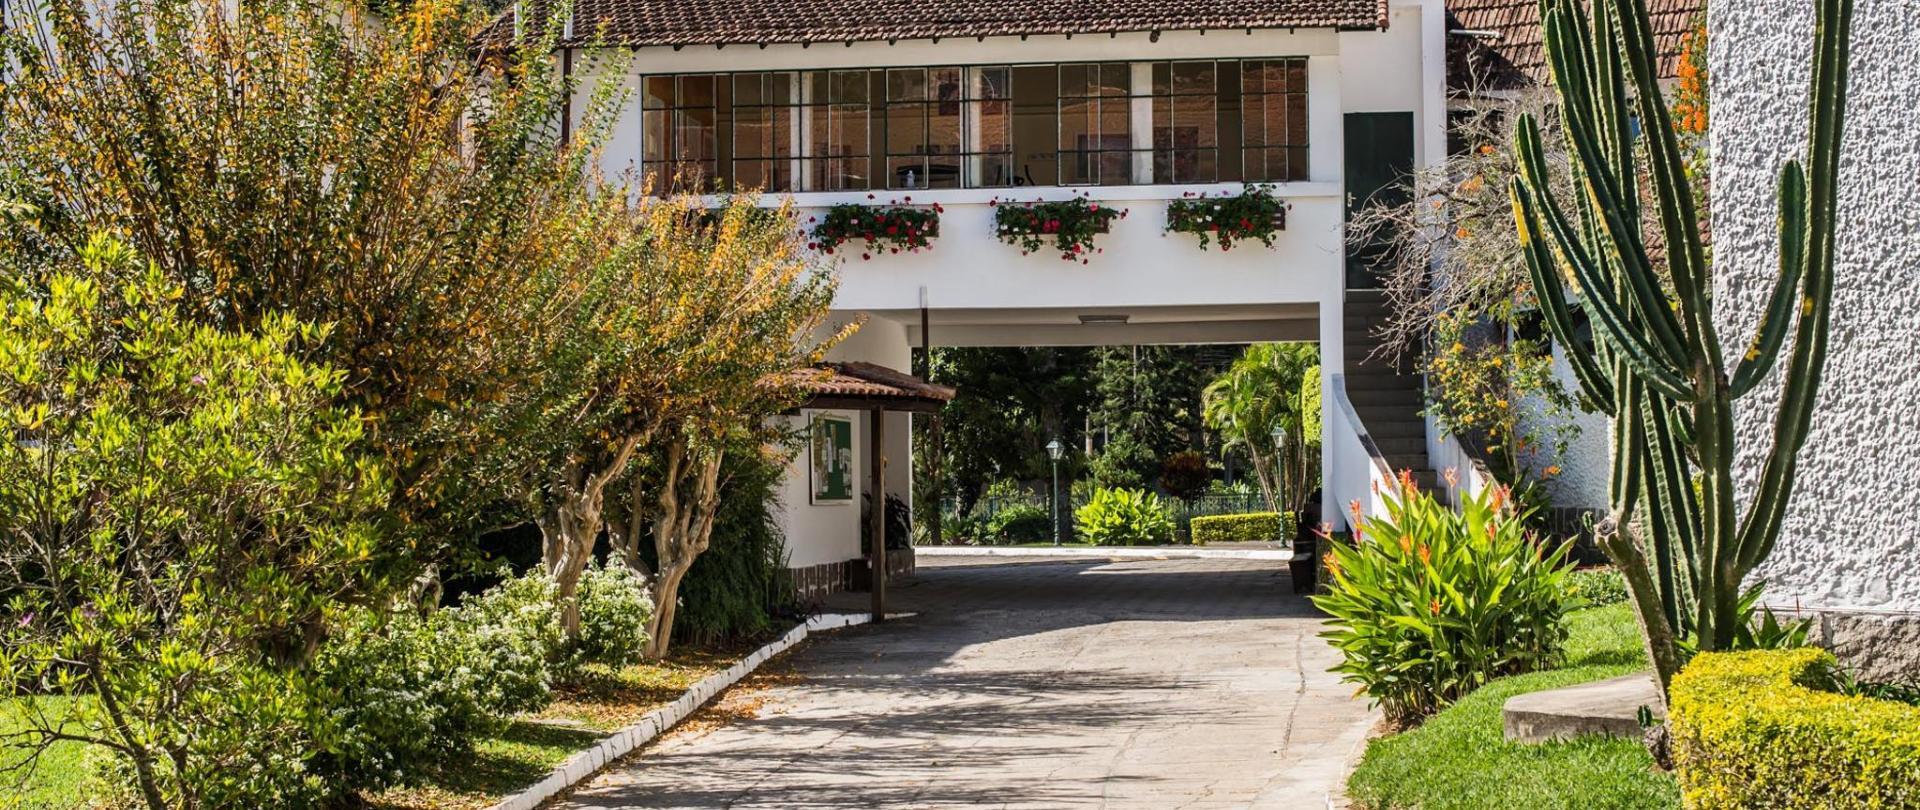 Hotel Bucsky Externo - Carlos Mafort-60.jpg